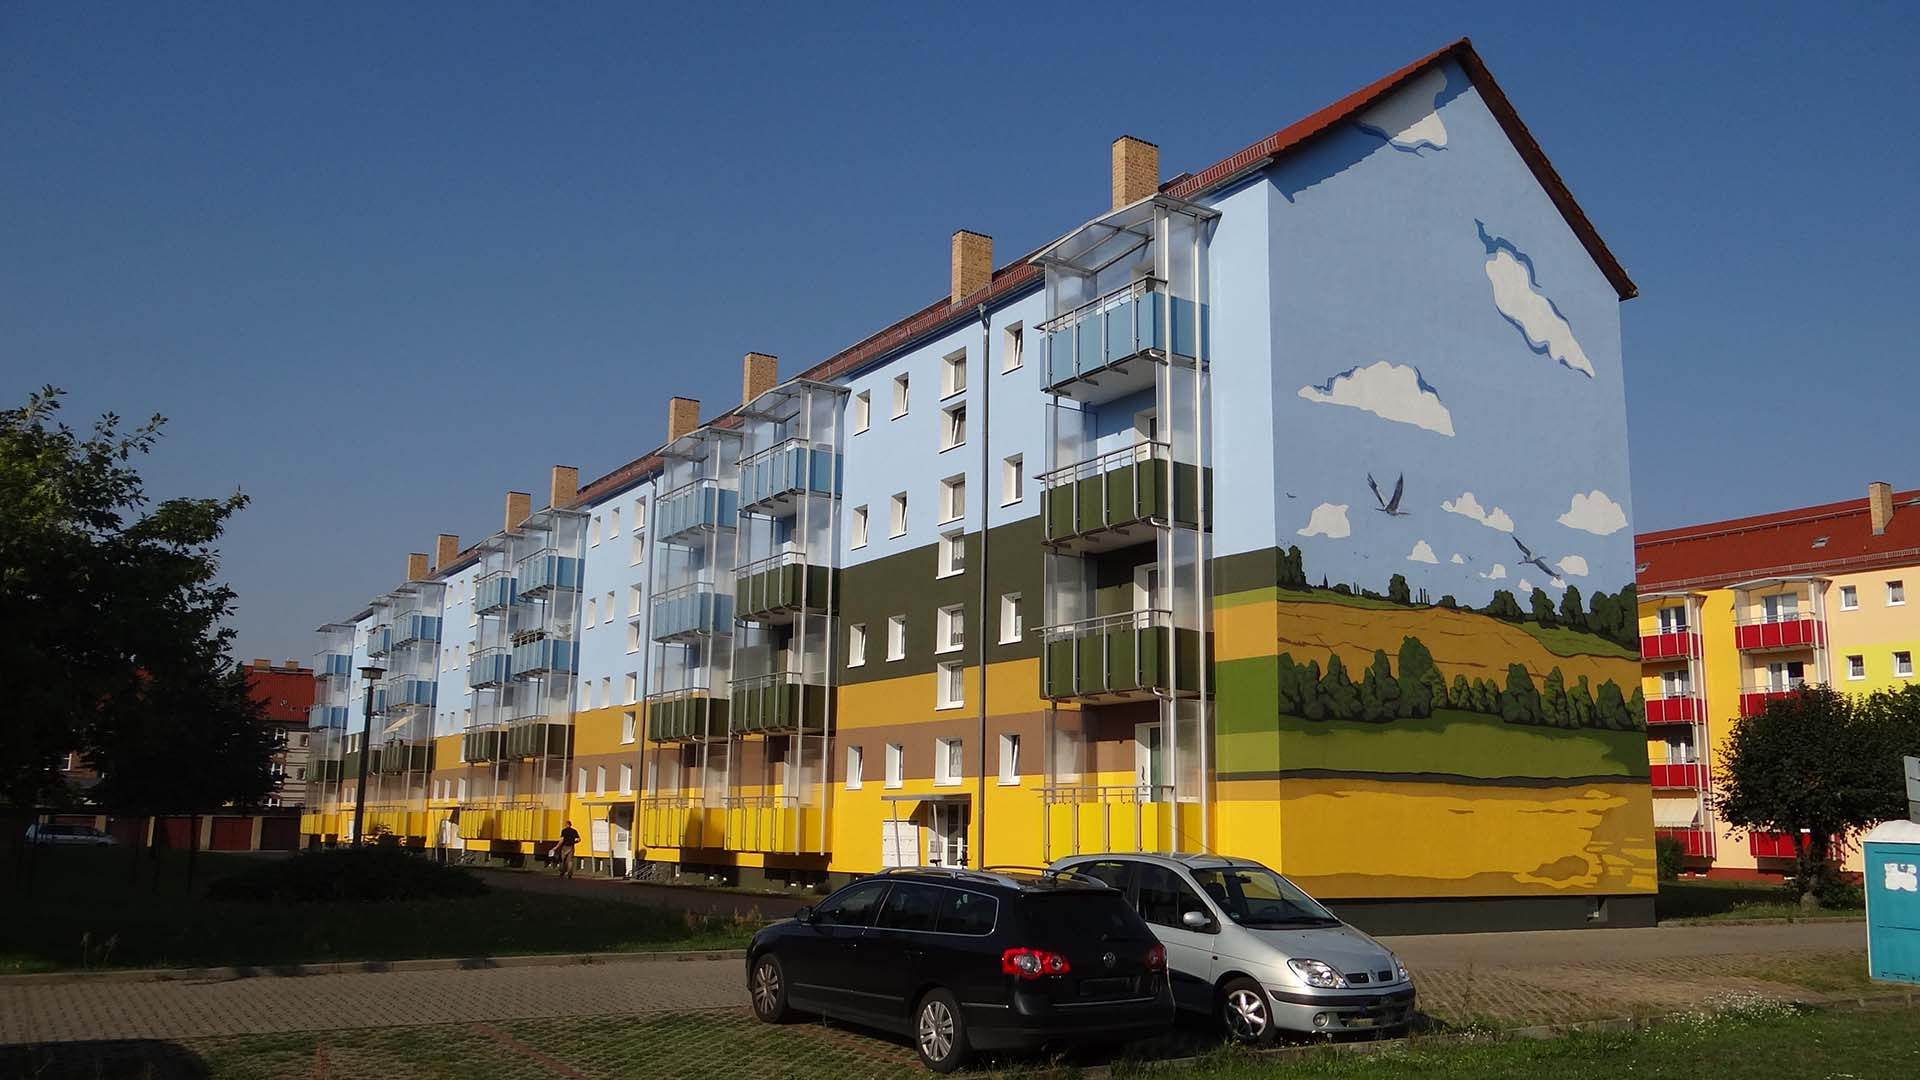 Fassadengestaltung – Tausenden Quadratmeter